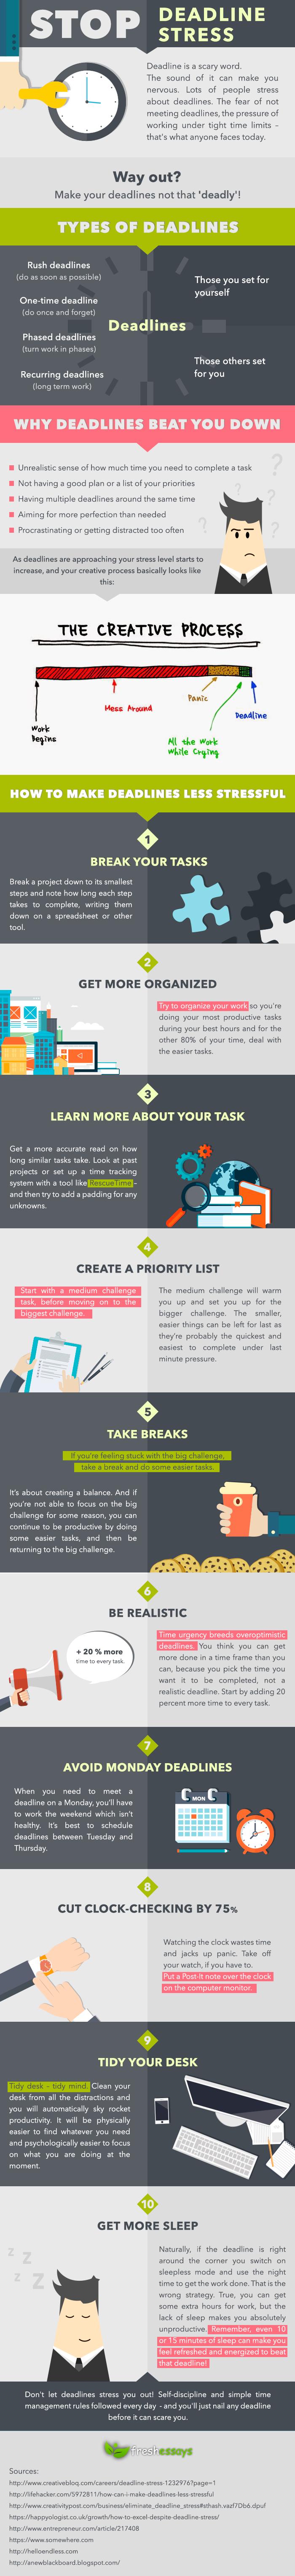 10 Ways to Beat Deadline Stress (Infographic)